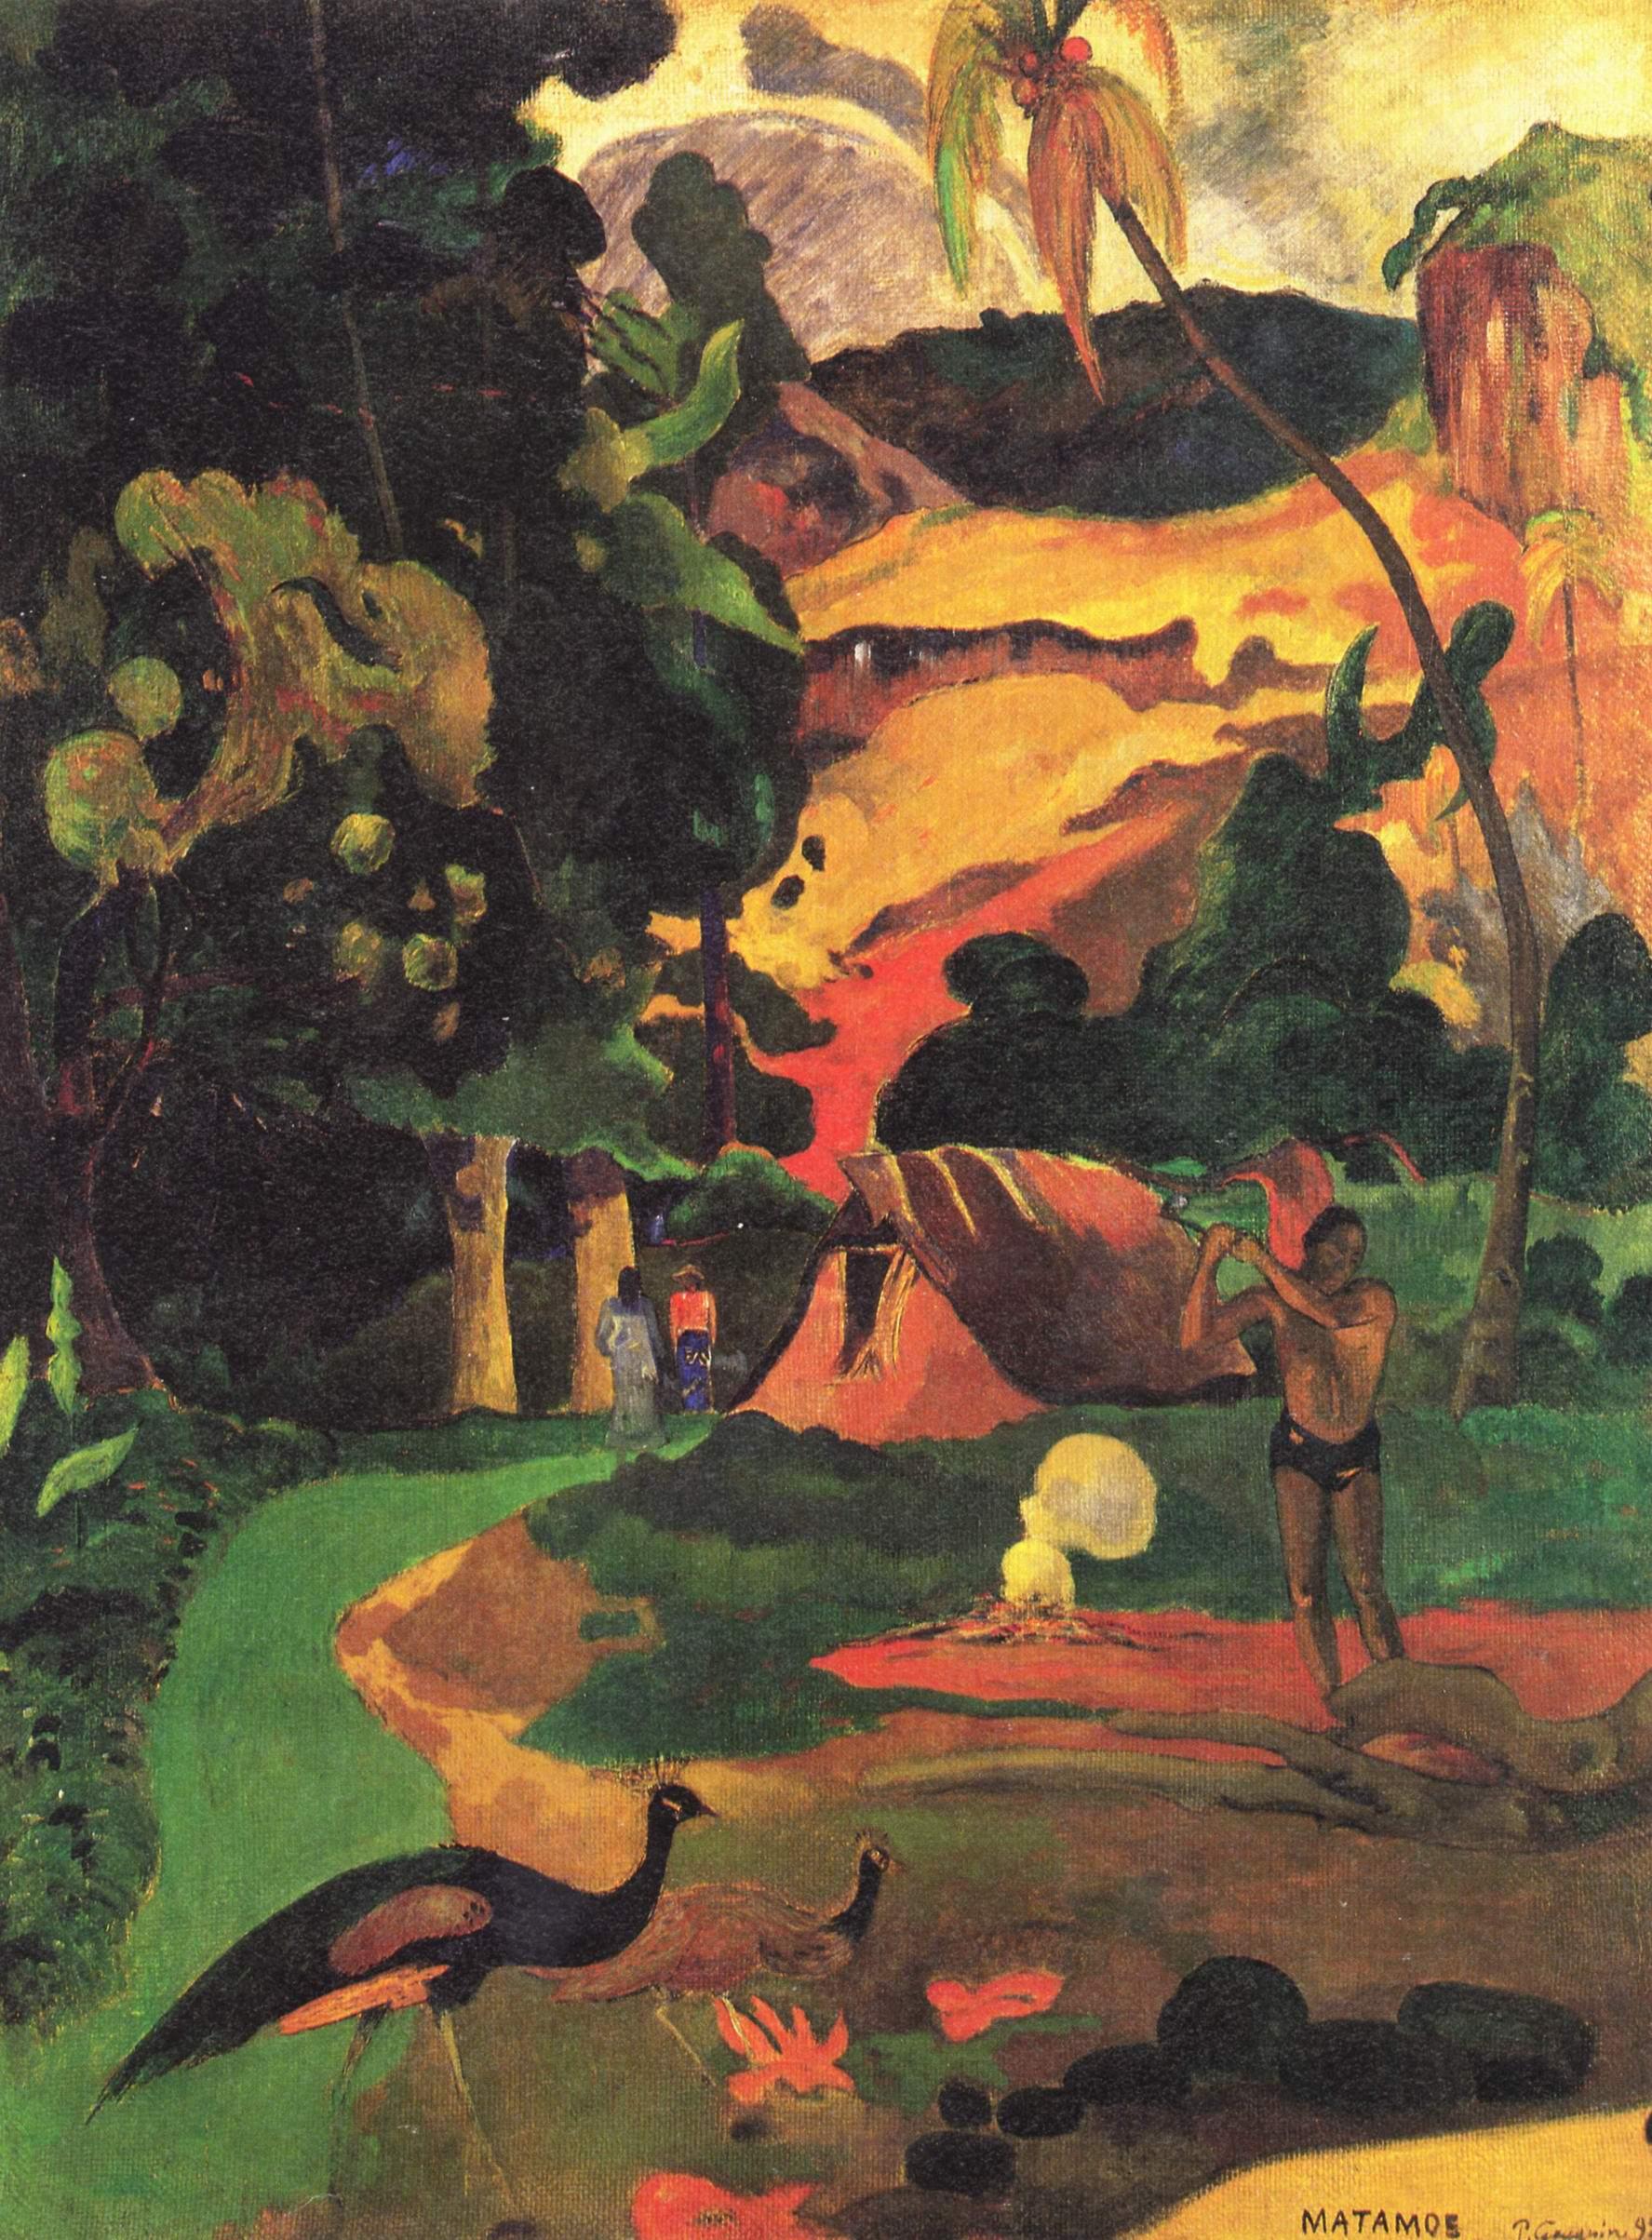 Пейзаж с фазанами (Matamoe), Поль Гоген